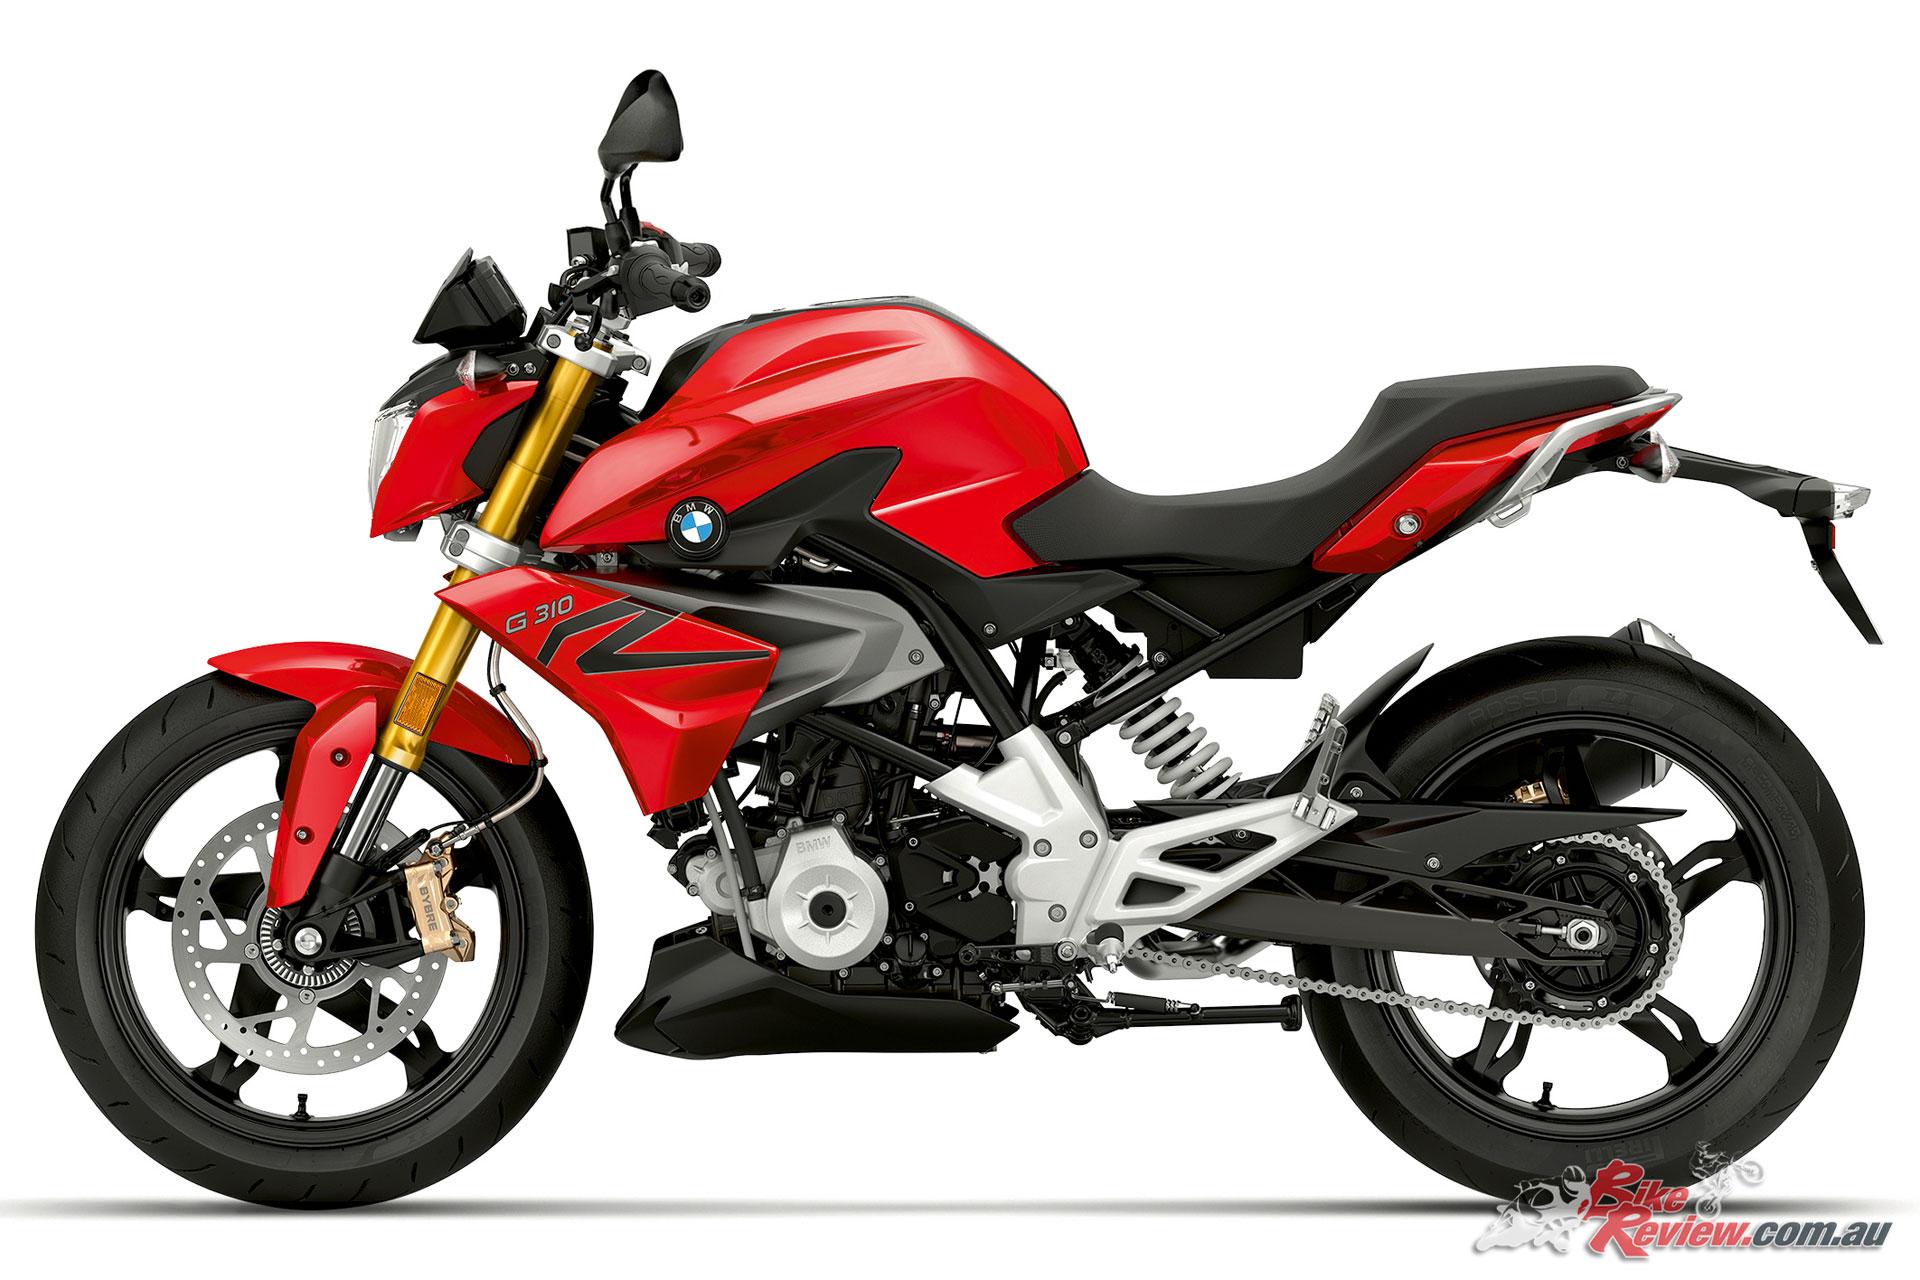 Bmw Motorrad Announce 2019 Model Updates Bike Review